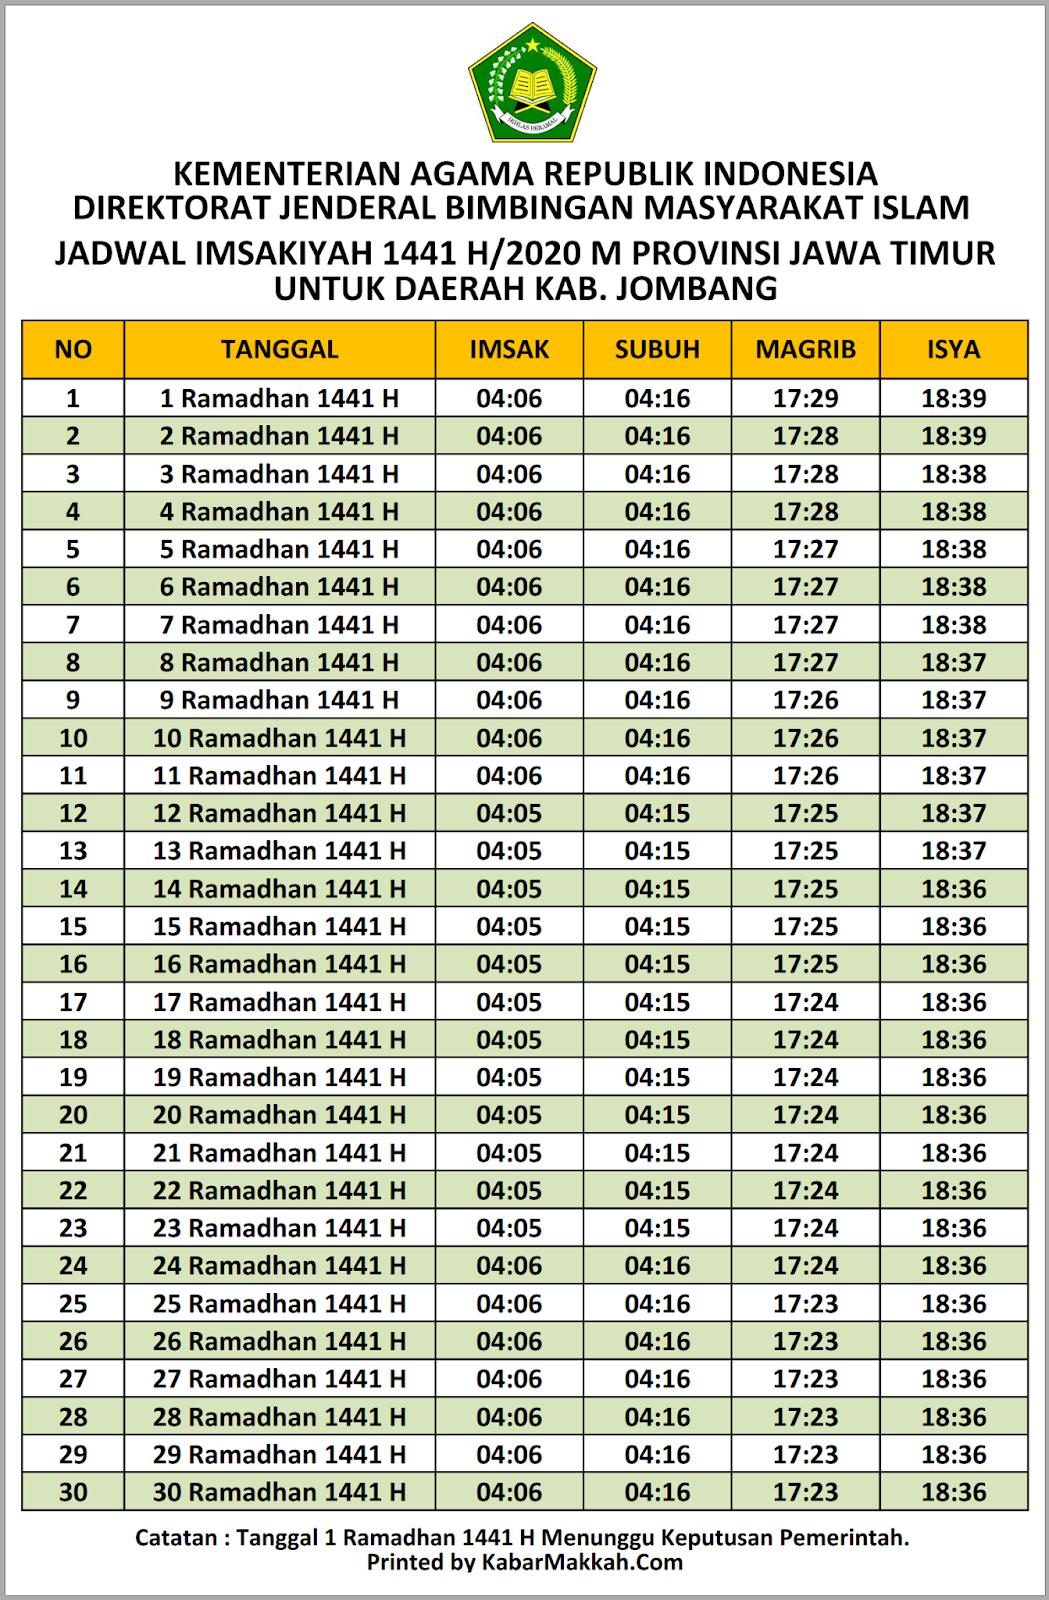 Jadwal Imsakiyah Jombang 2020